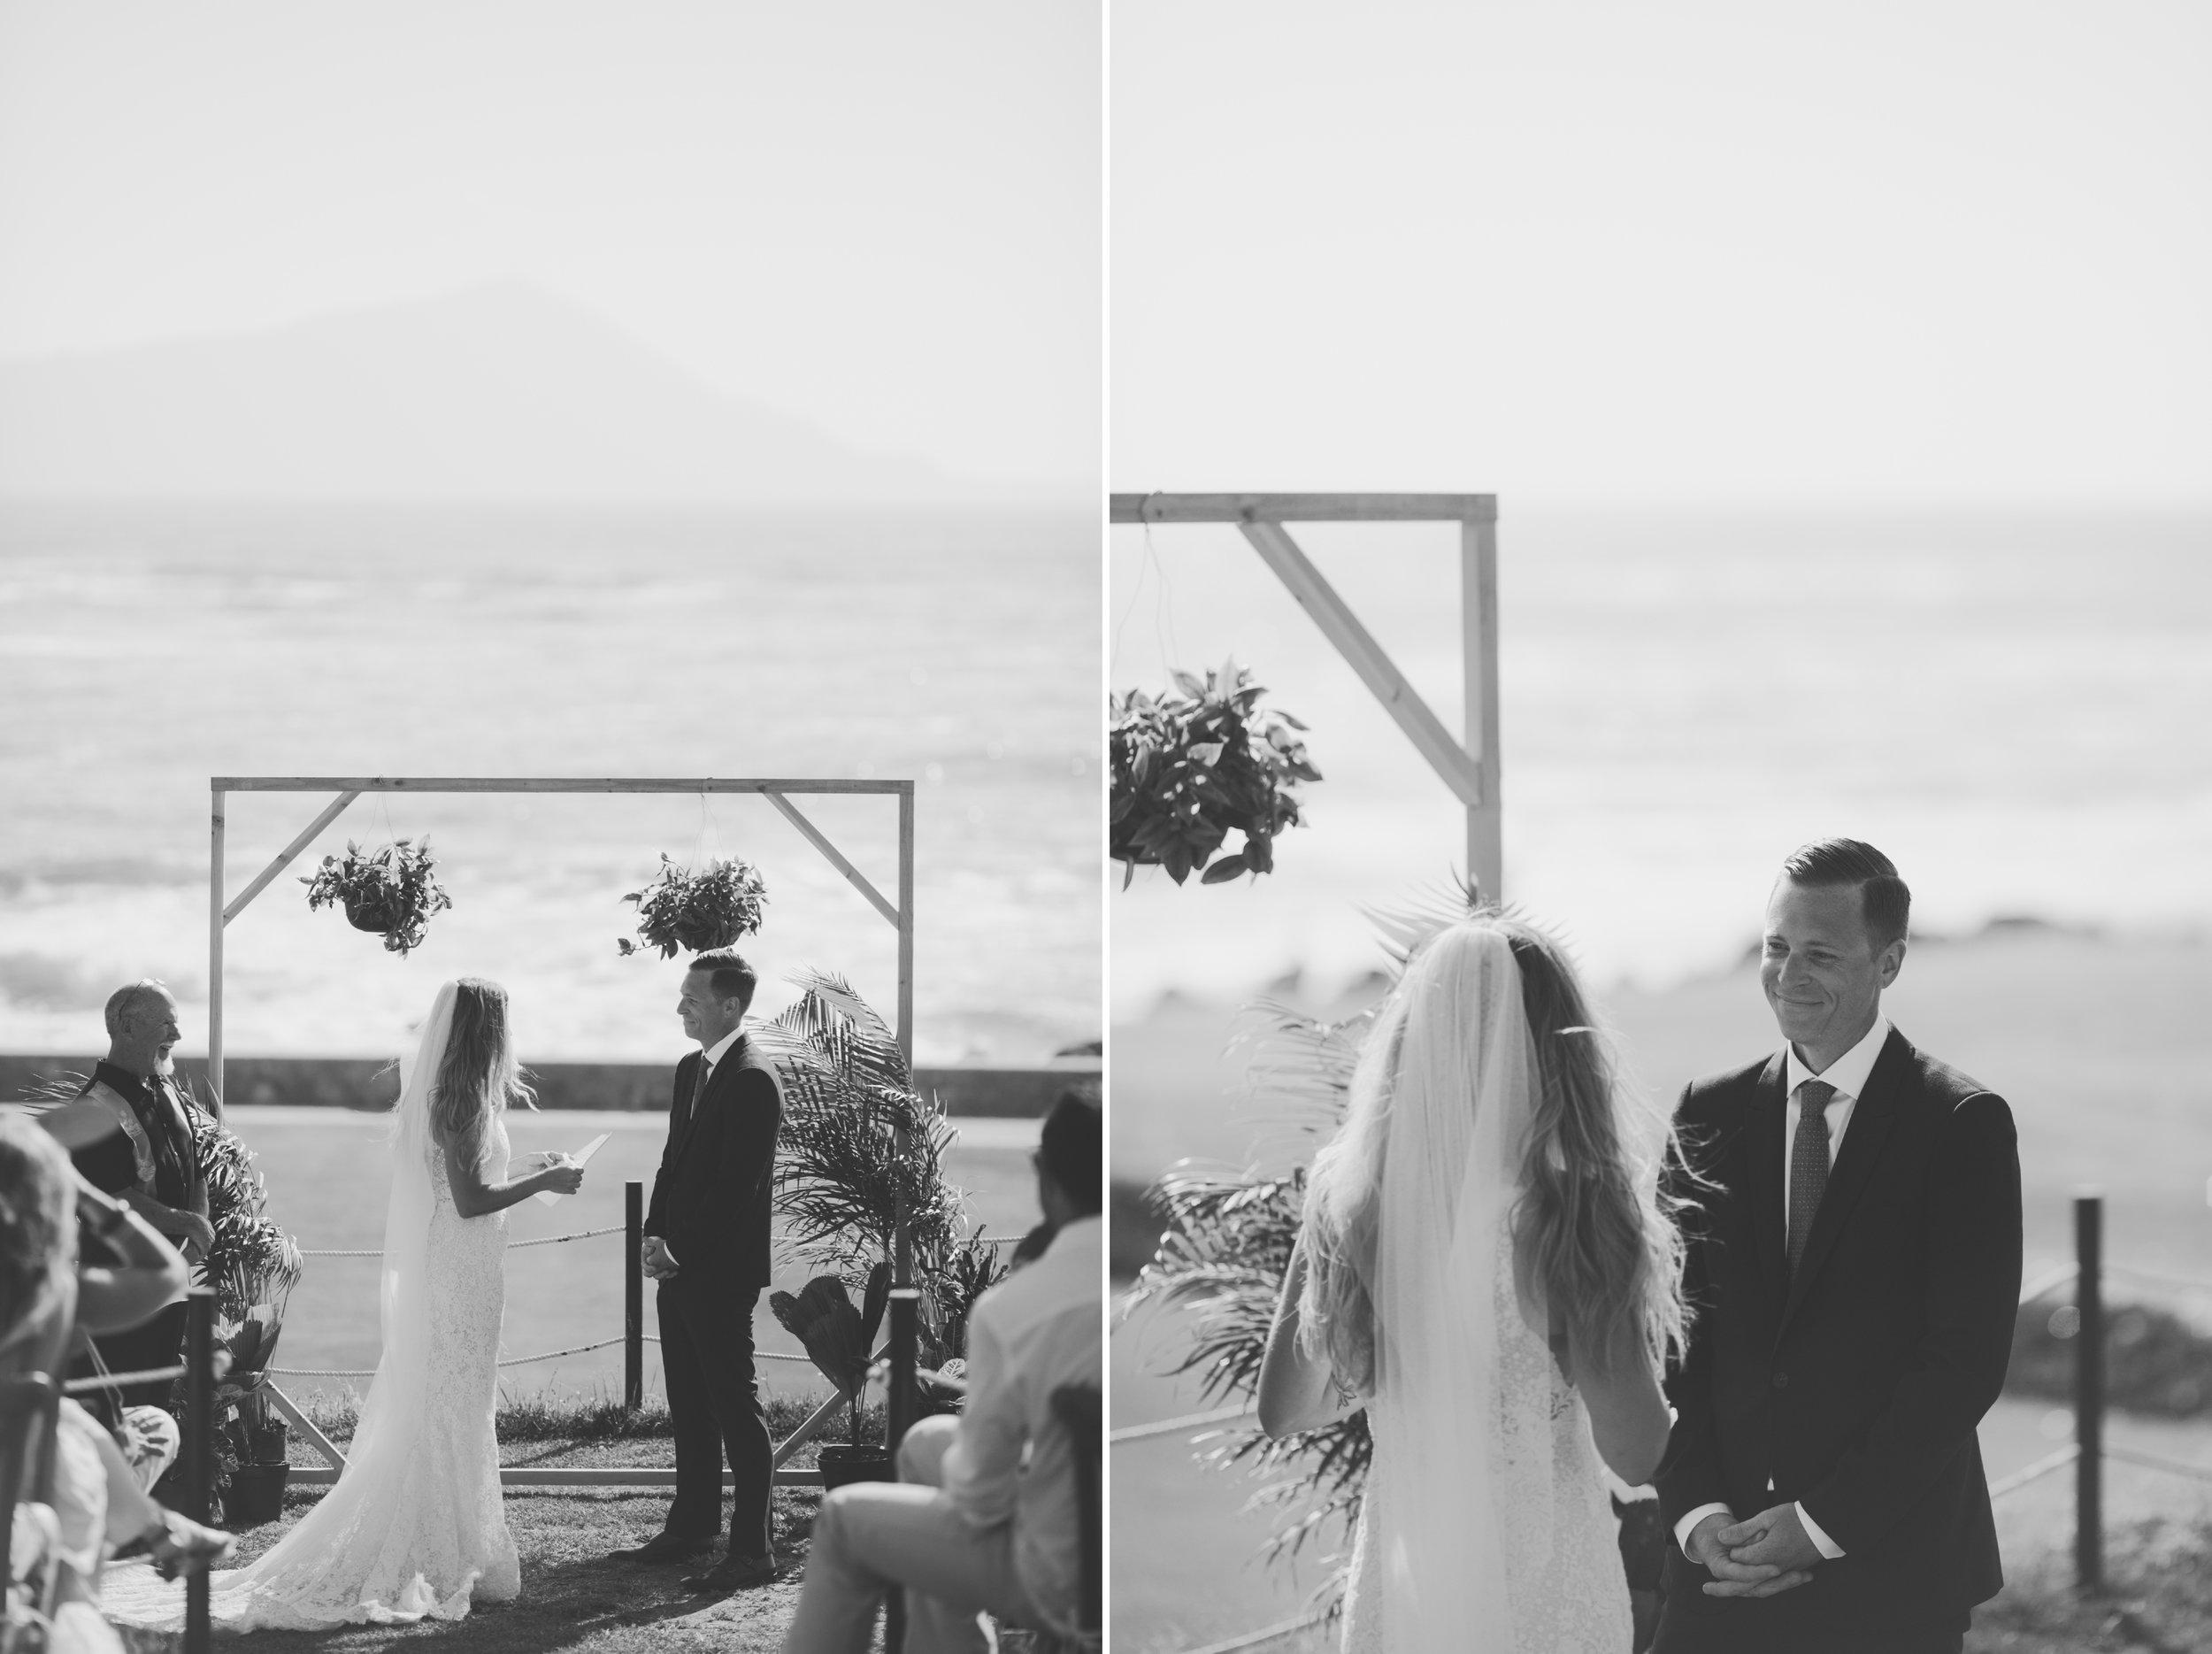 amandavanvels_ensenada_mexico_wedding_044.jpg